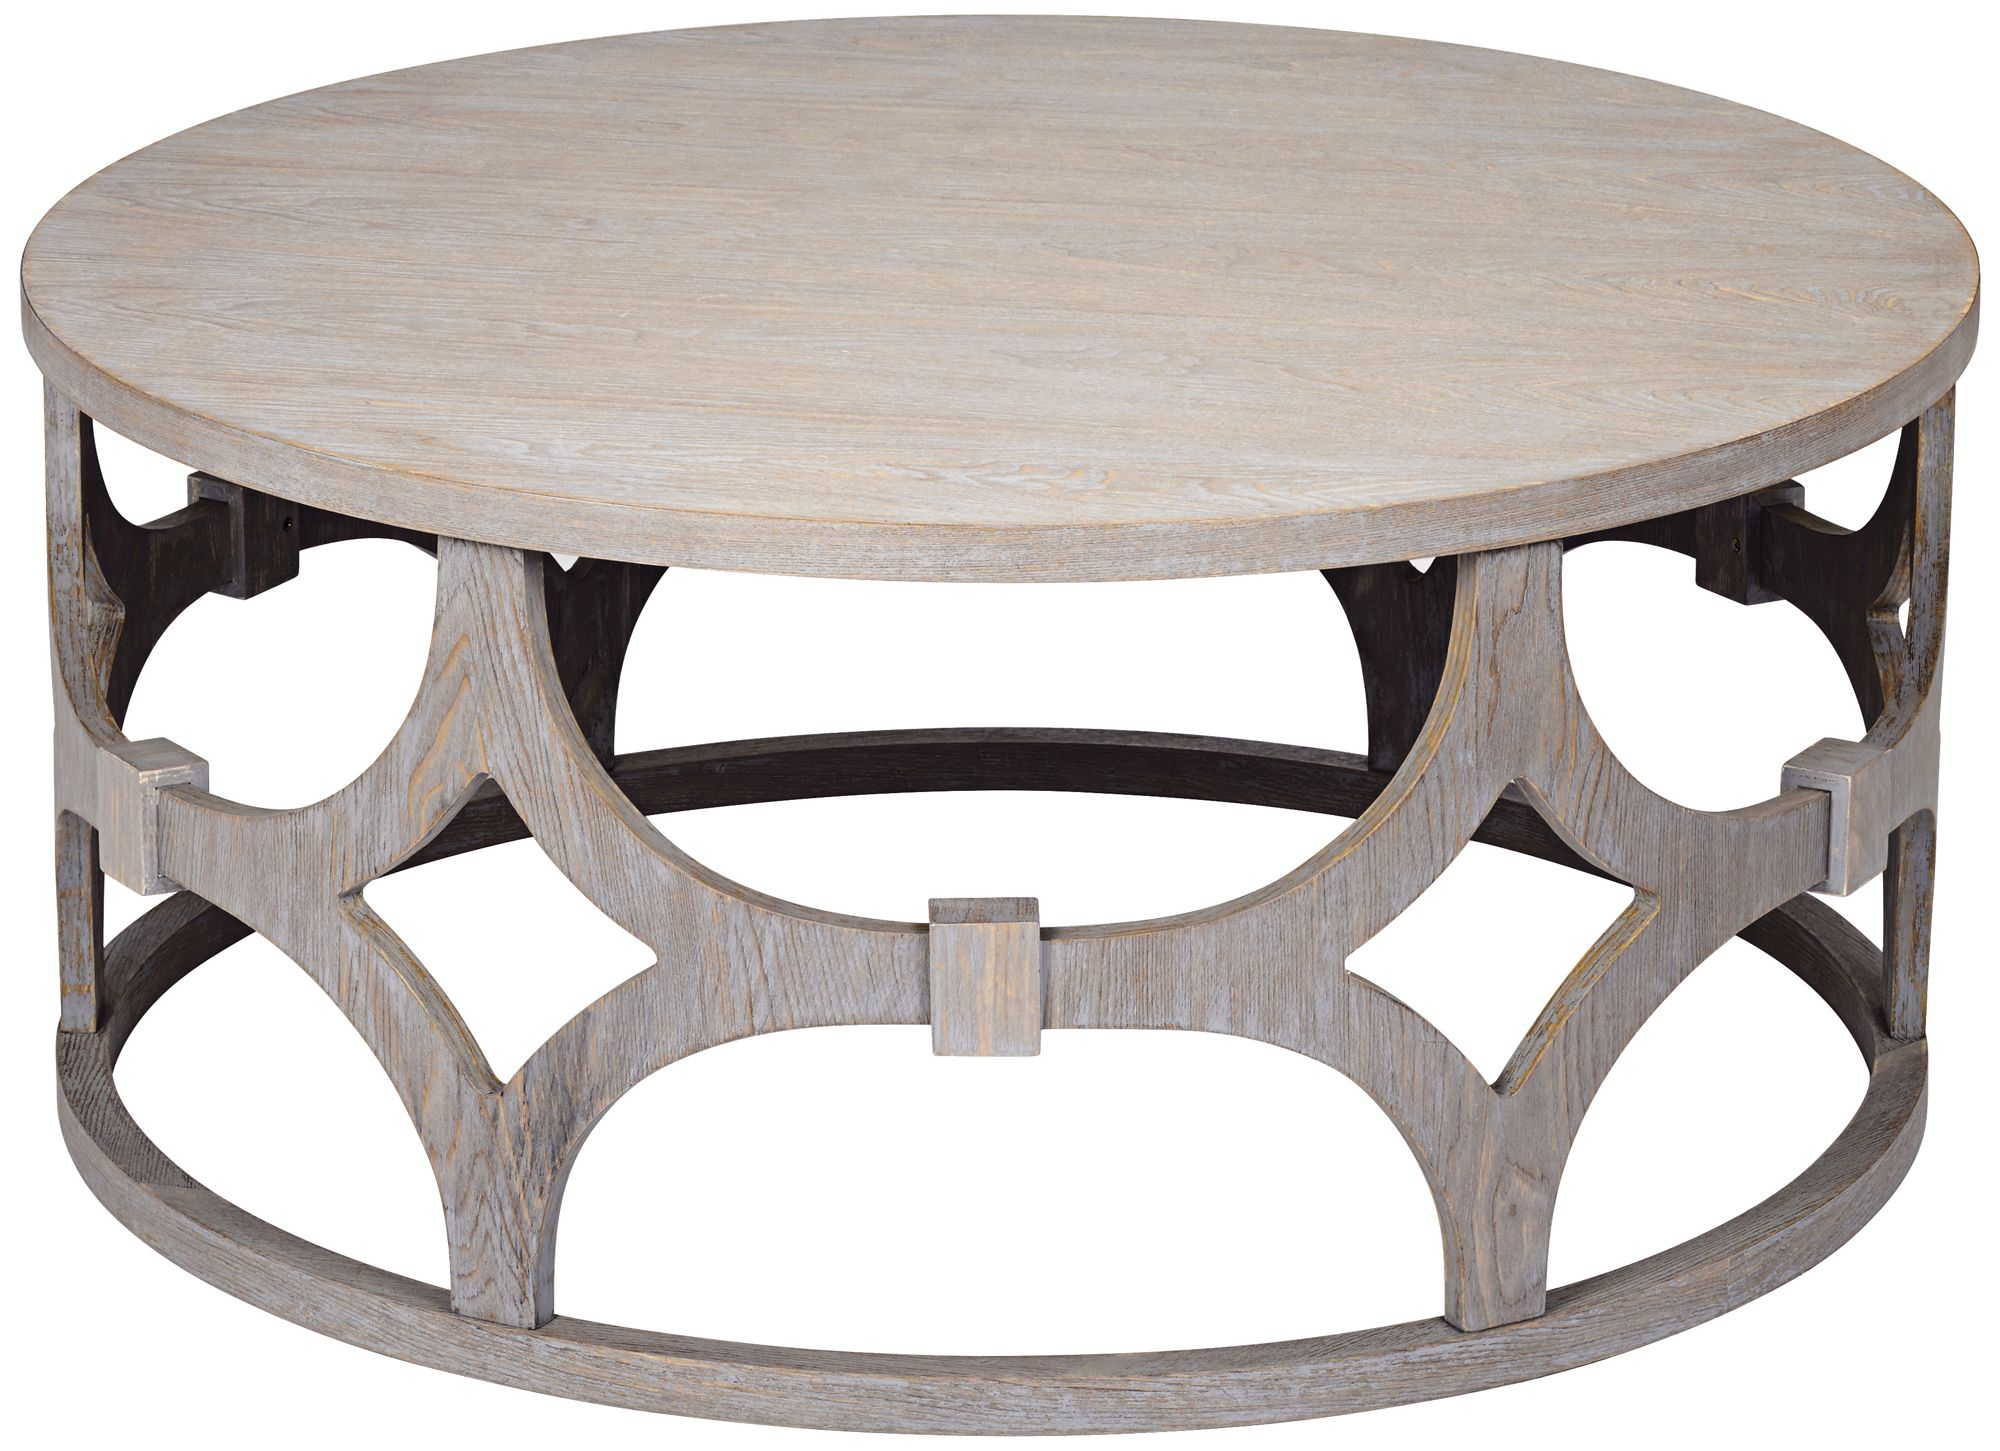 Grey wash coffee table marbella grey washed ash u0026 mirror 2 lanini gray wash round coffee table geotapseo Images